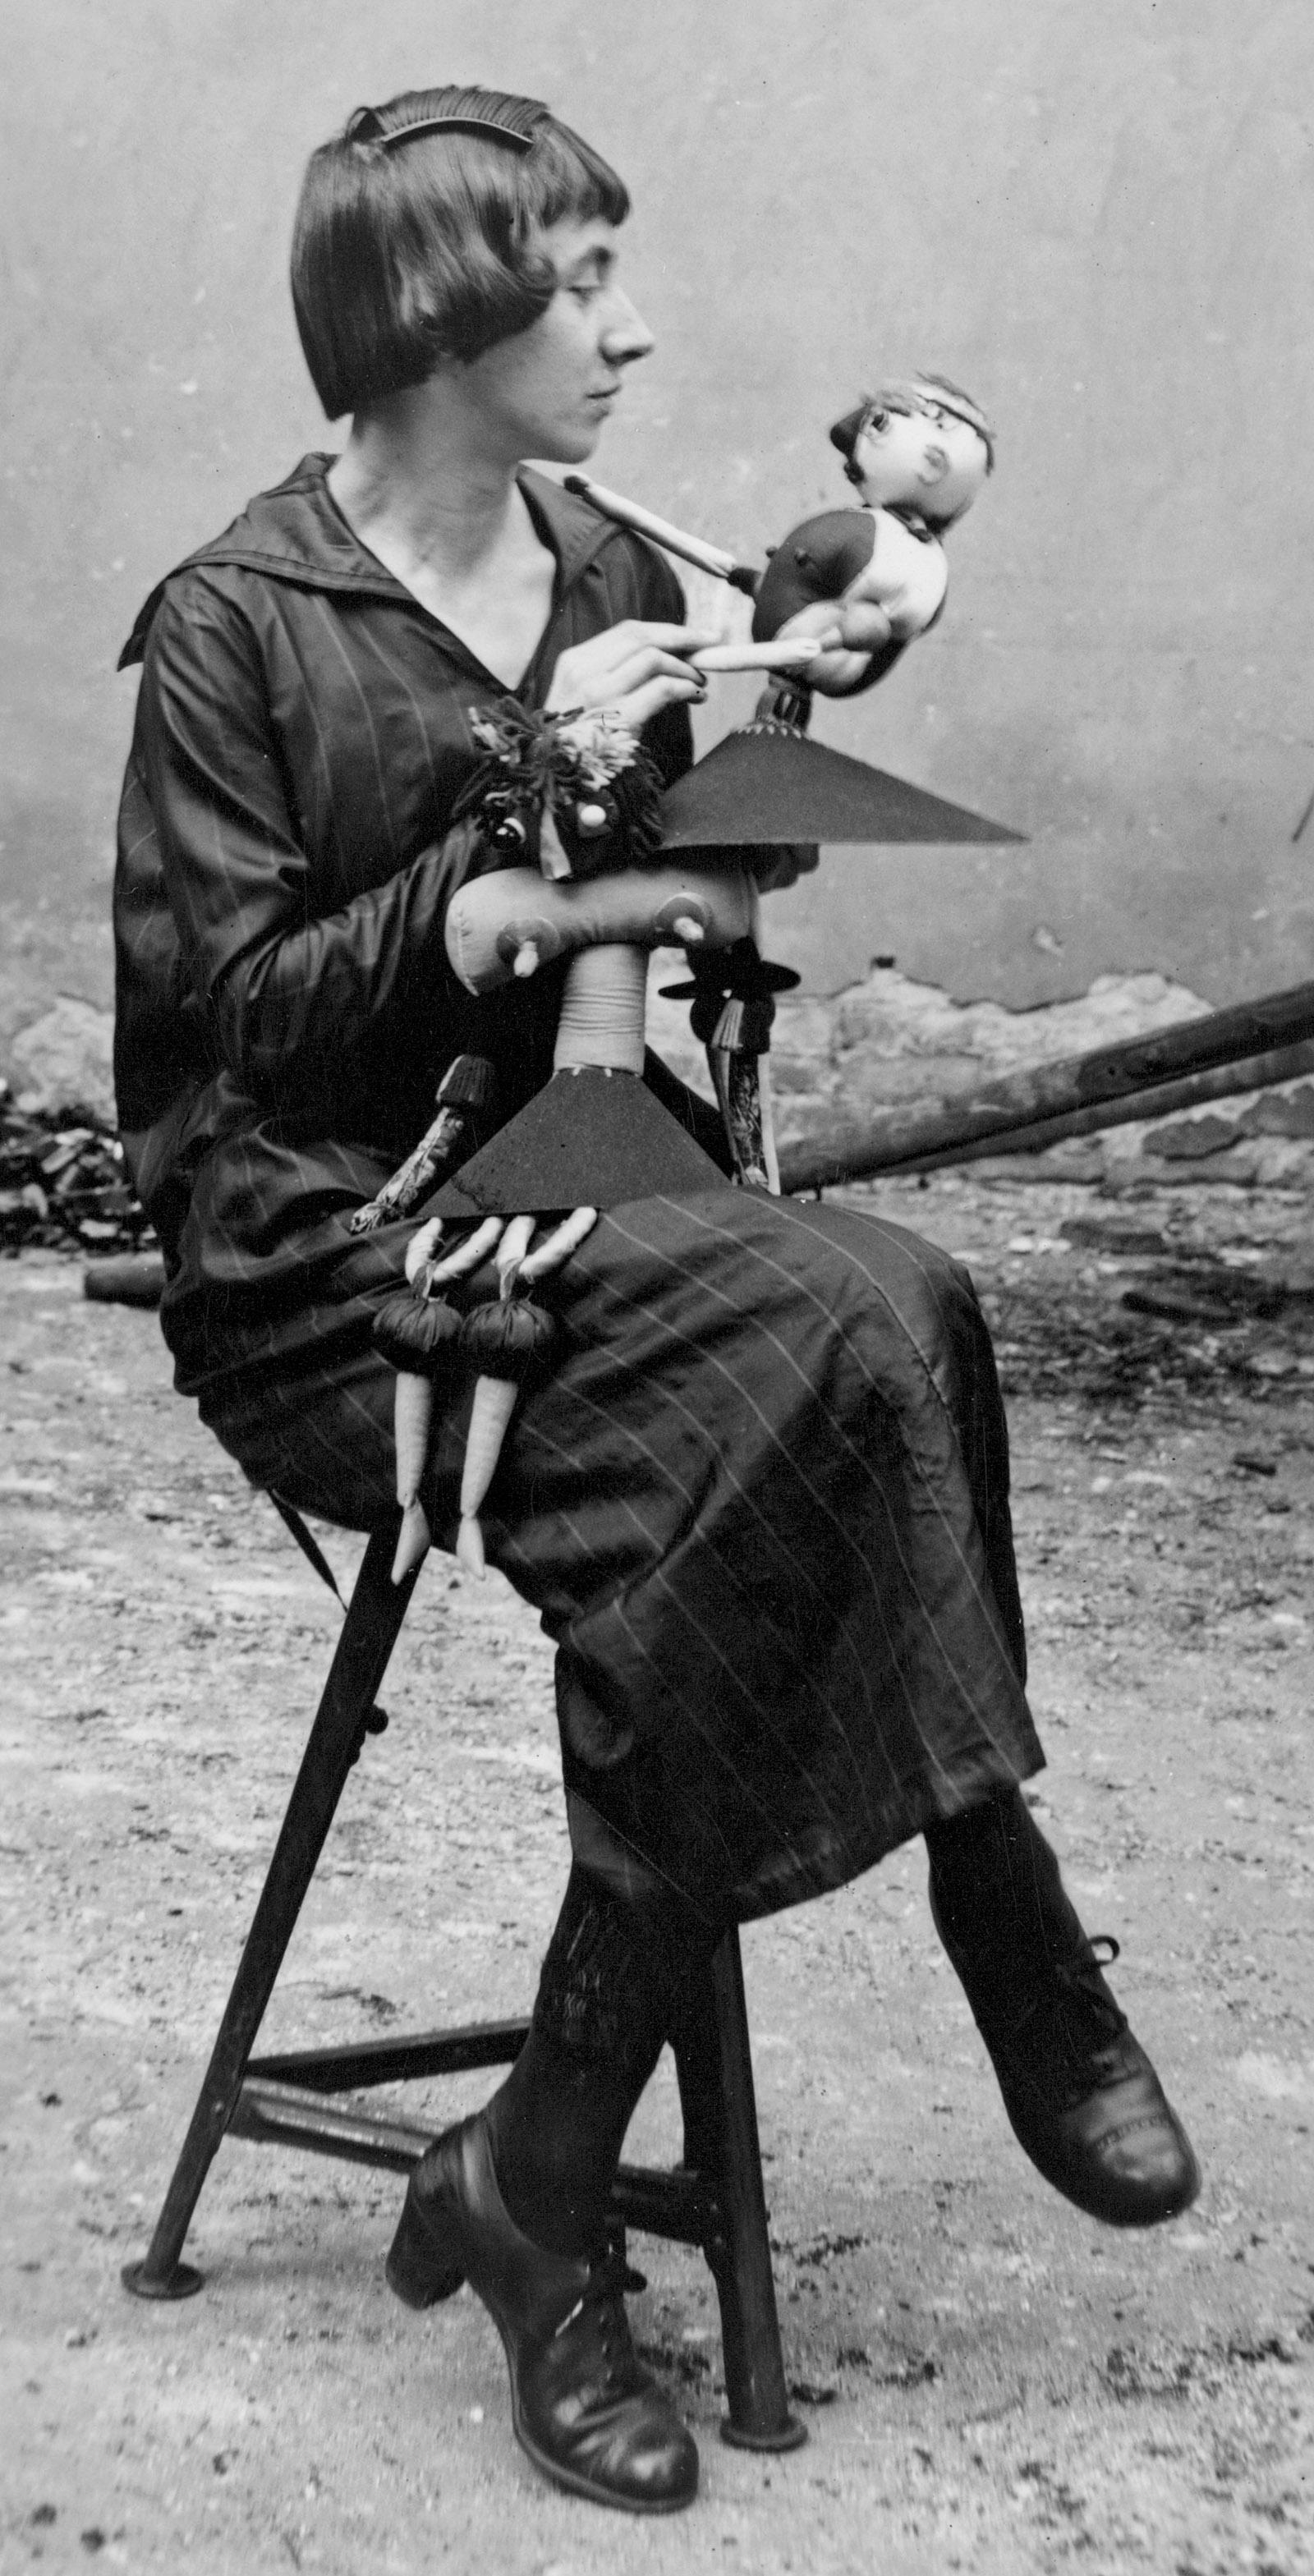 Hannah Höch with Dada puppets, Berlin, 1920